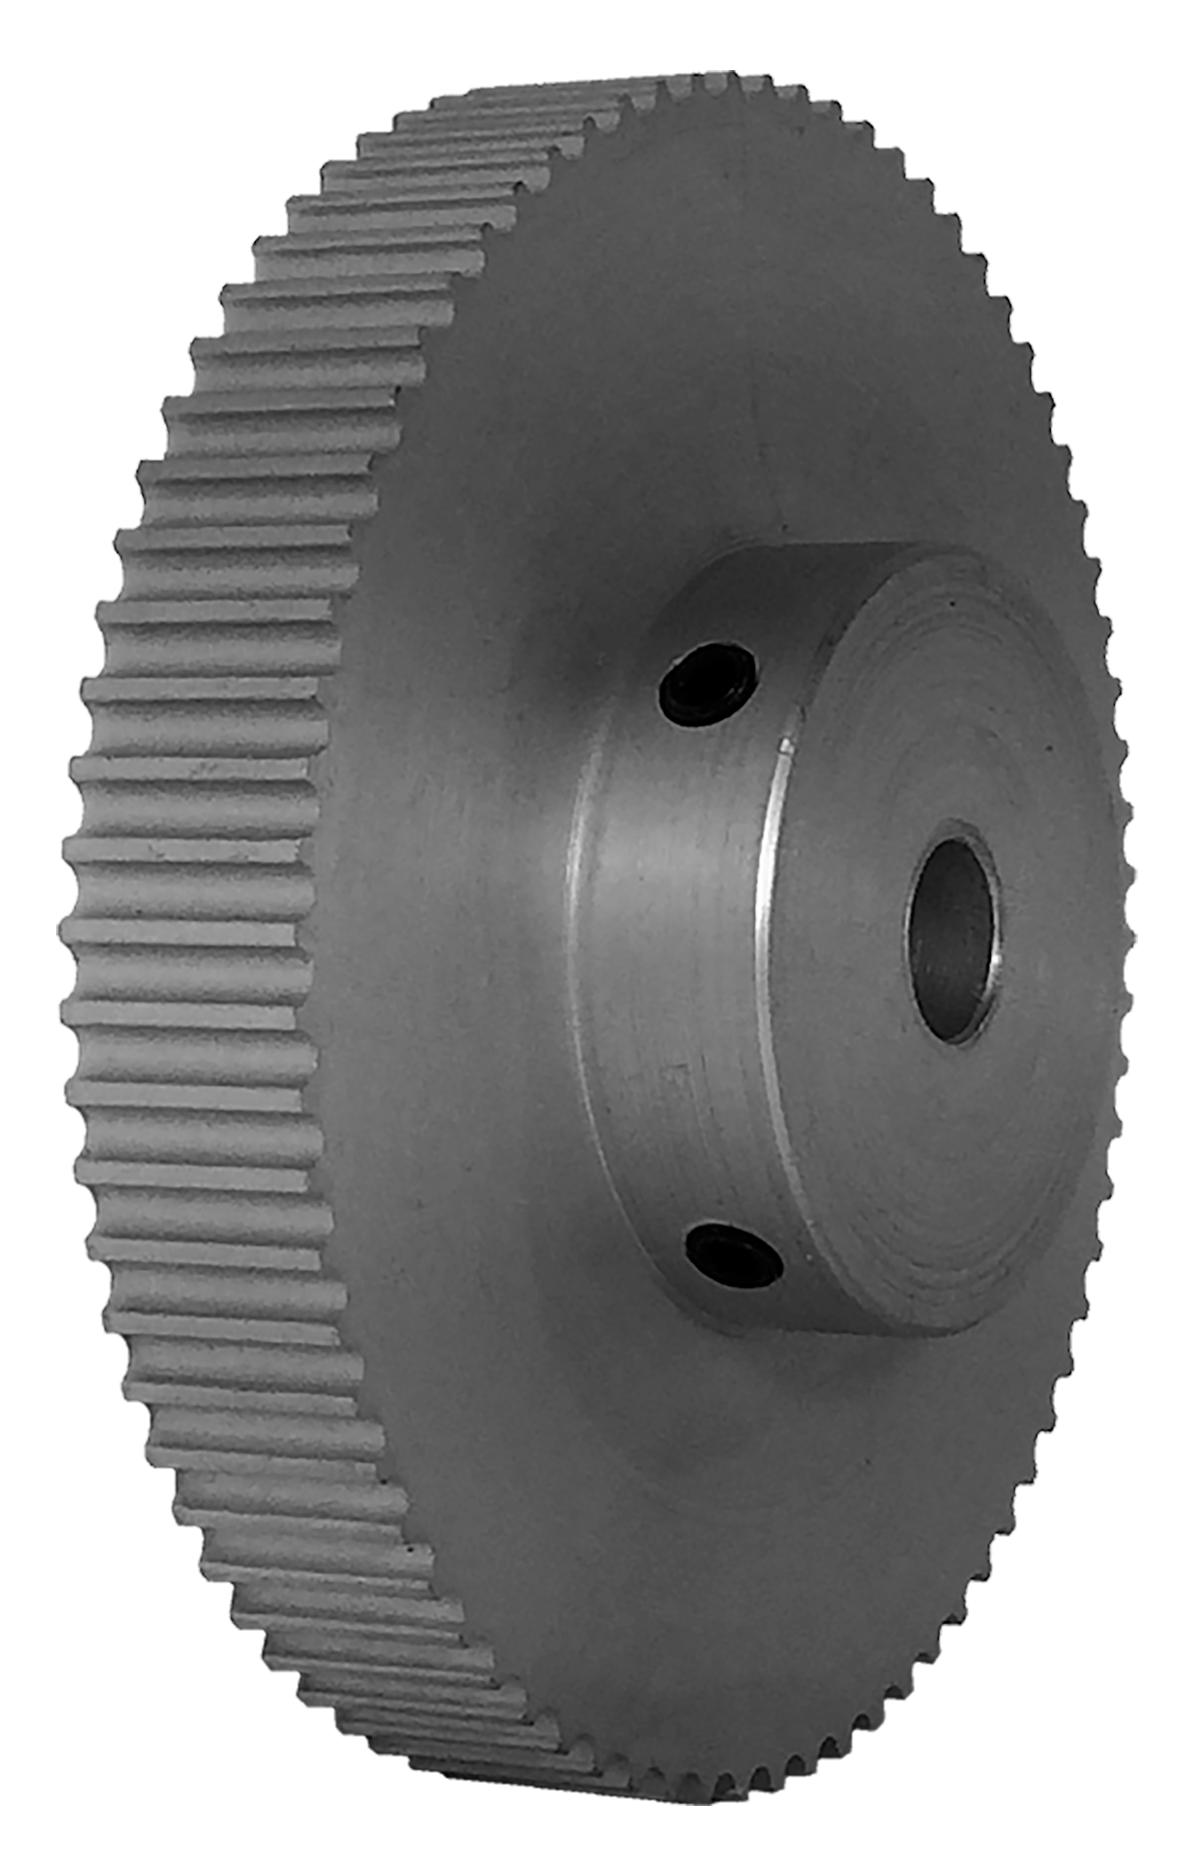 74-3P06-6A4 - Aluminum Powerhouse® Pulleys